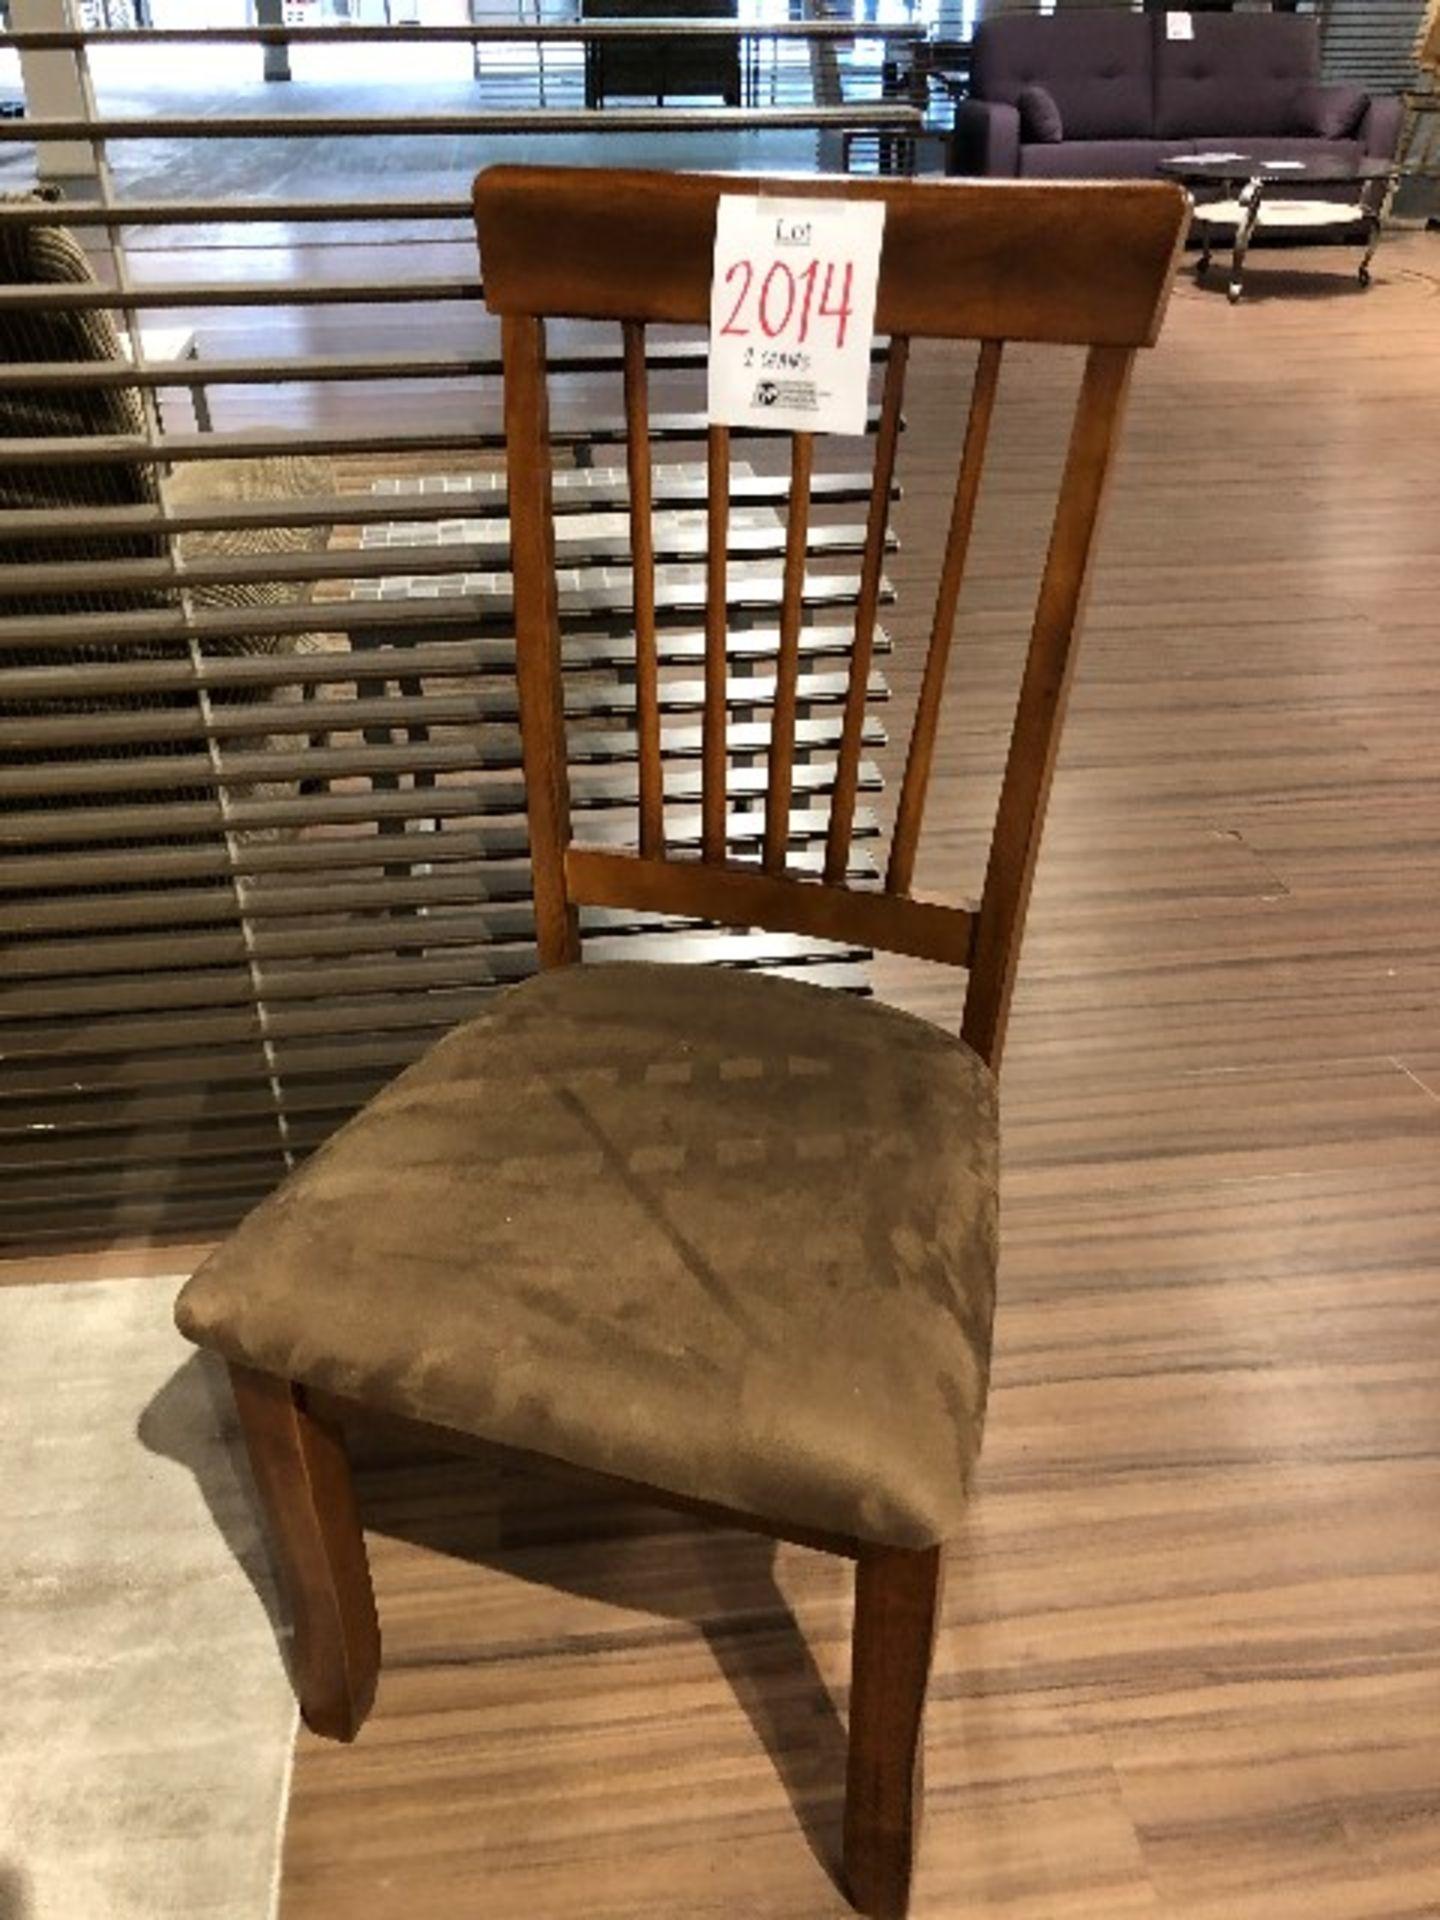 Lot 2014 - Velour chairs w/open back, 2 pcs